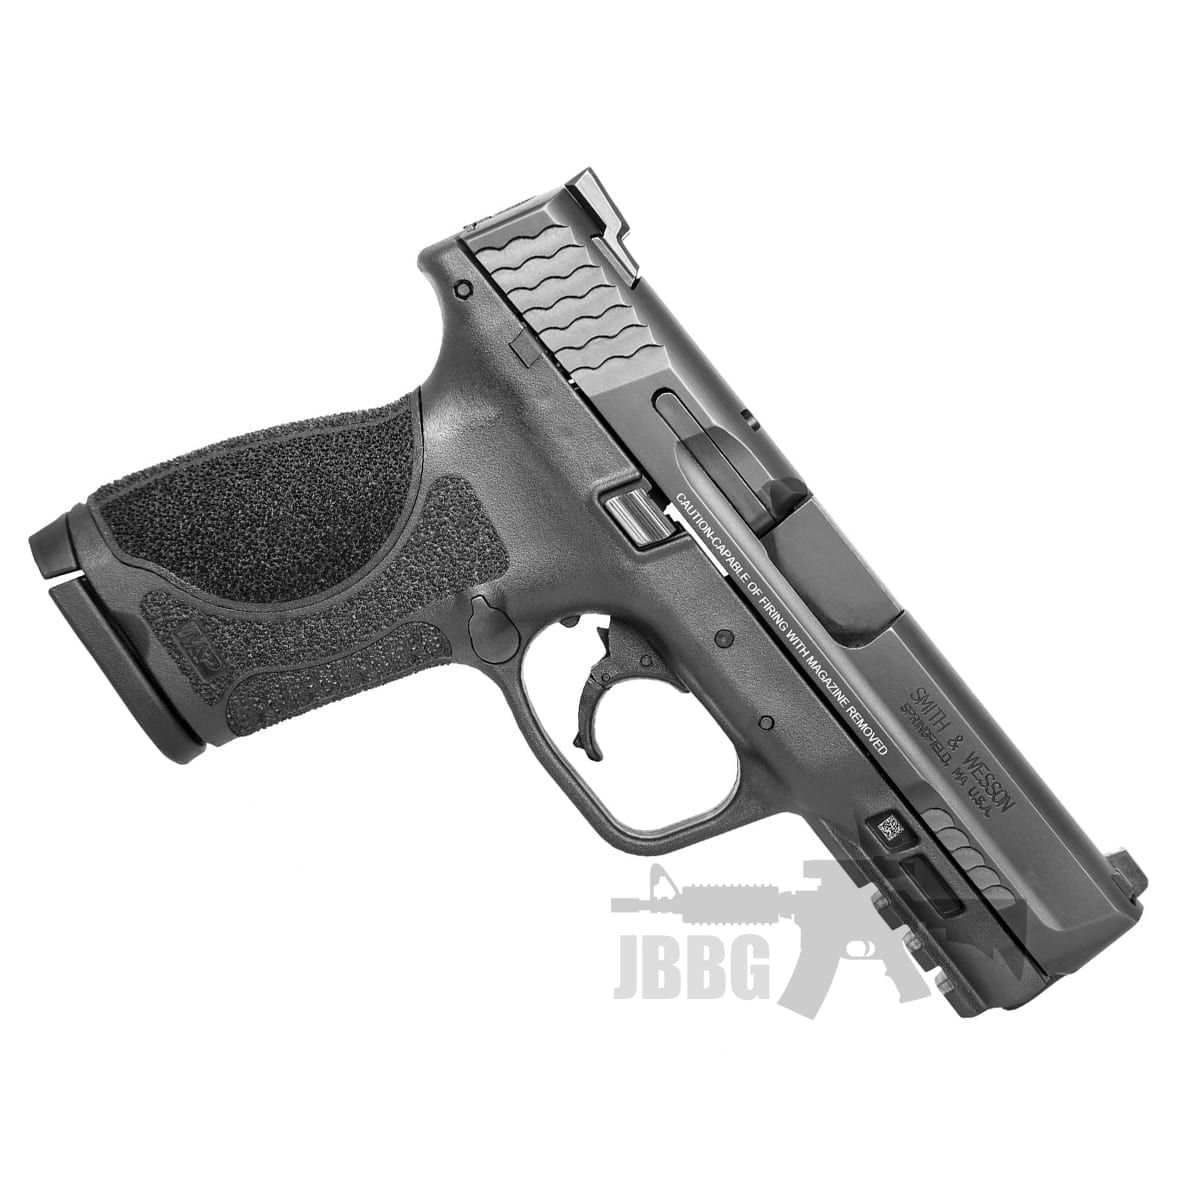 M&P40 Compact 40 S&W air pistol